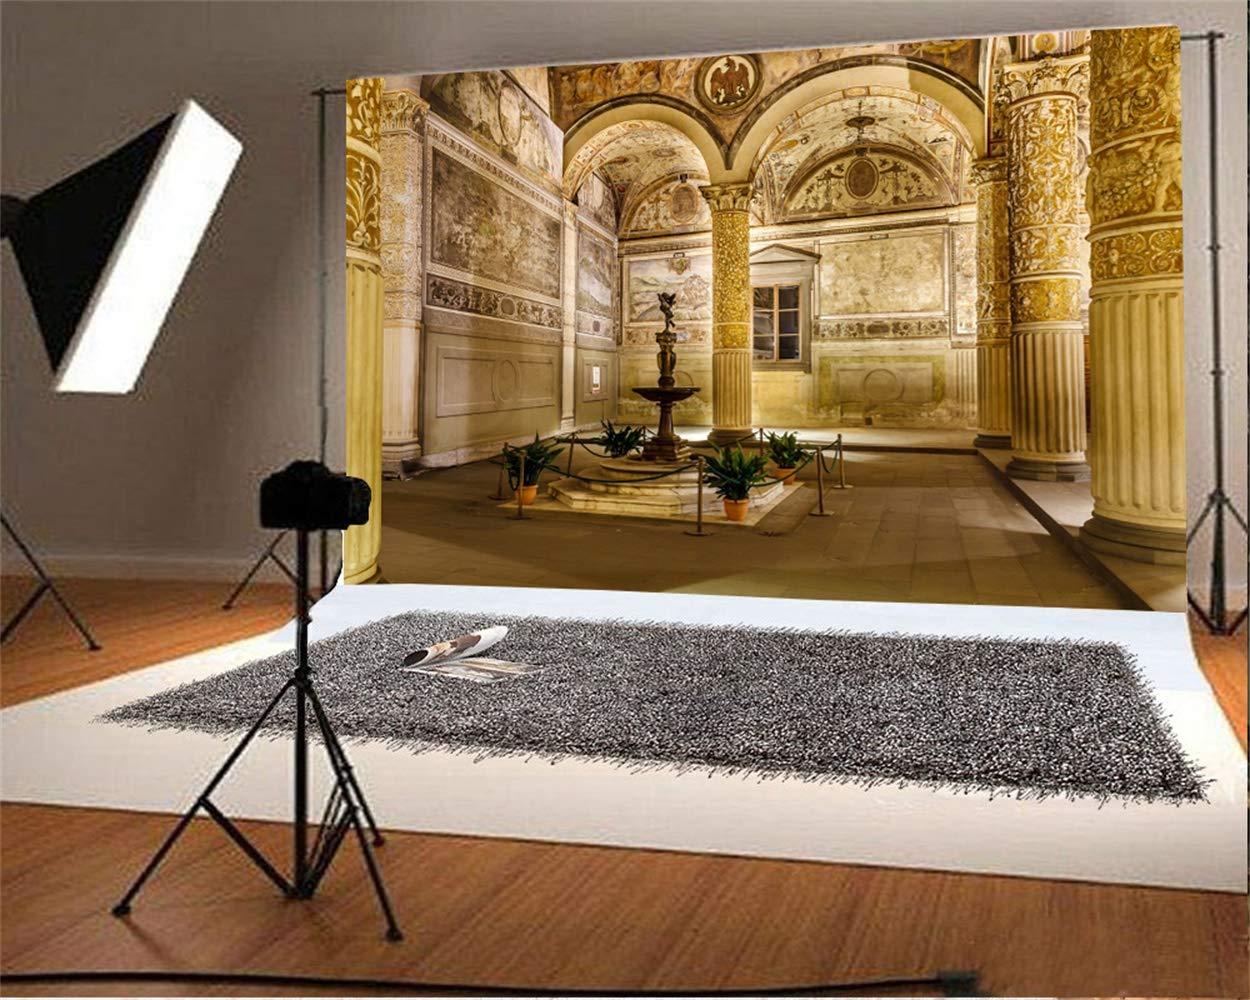 10x7ft Luxurious Interior of Palazzo Vecchio Vinyl Photography Background Antique European Massive Romanesq Historical Building Backdrop Cultural Relics Scenic Spot Studio Props